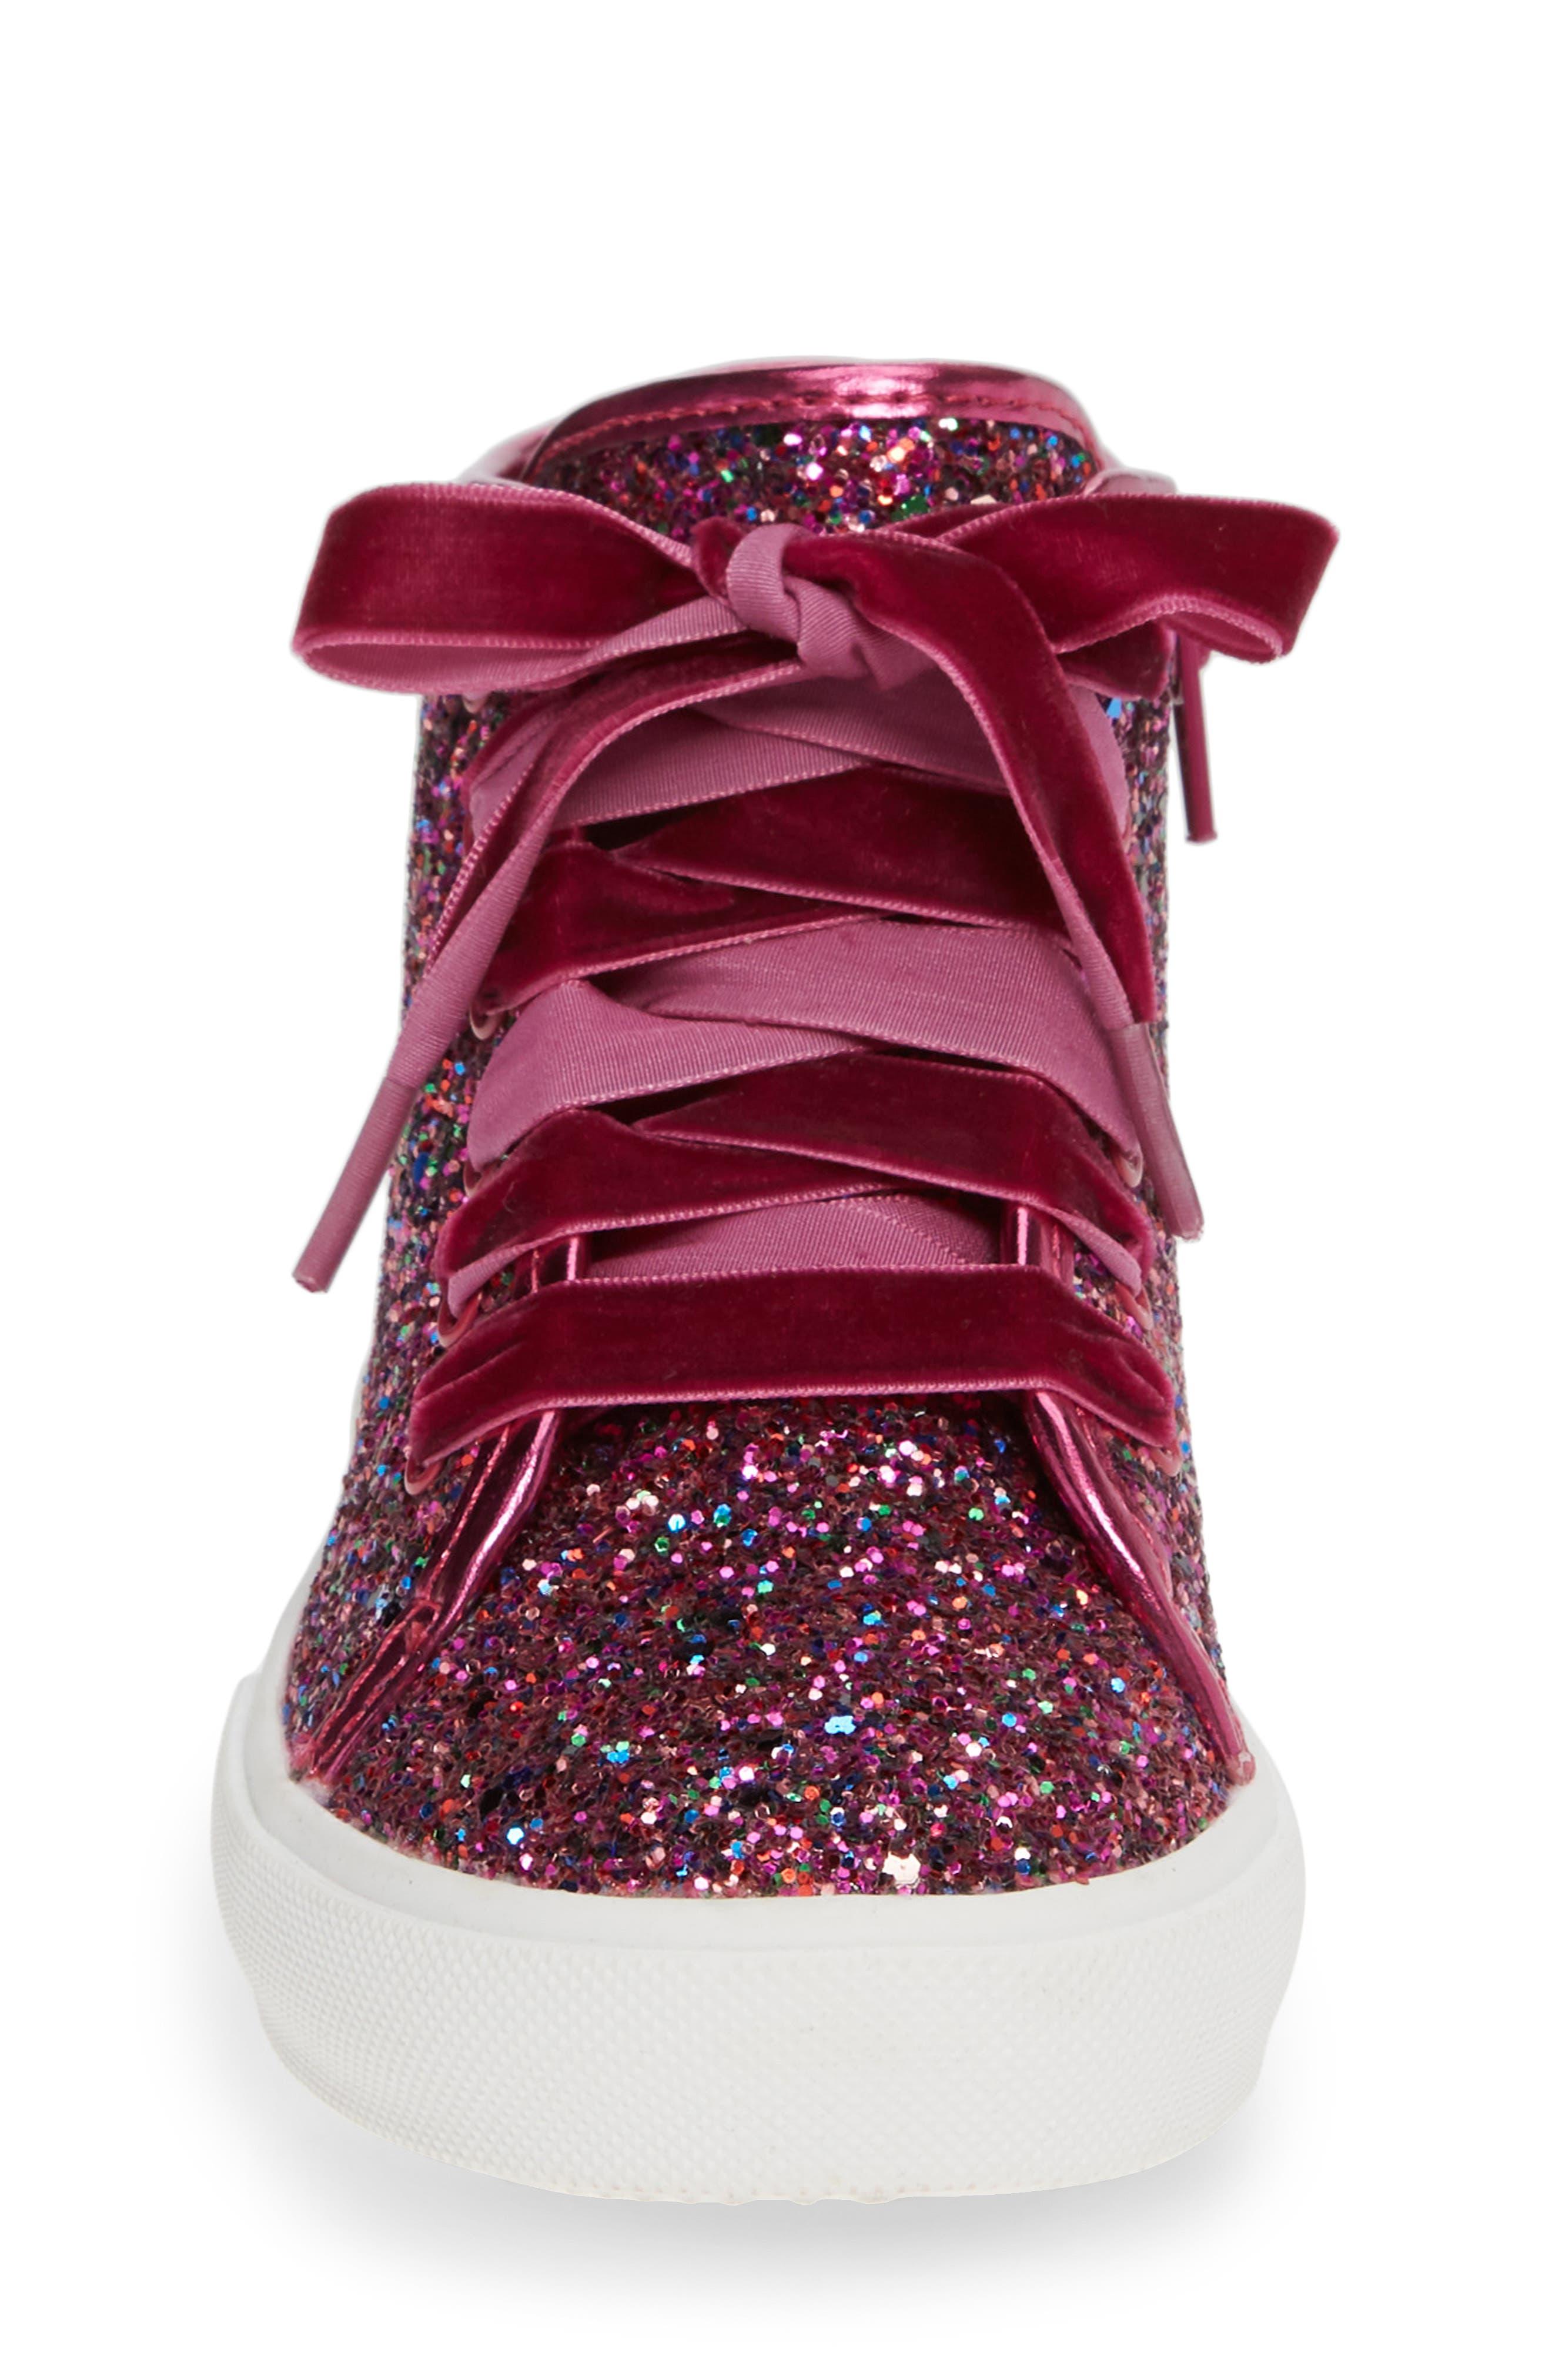 TUCKER + TATE, Skylar Glitter Sneaker, Alternate thumbnail 4, color, FUSCHIA MULTI GLITTER PU